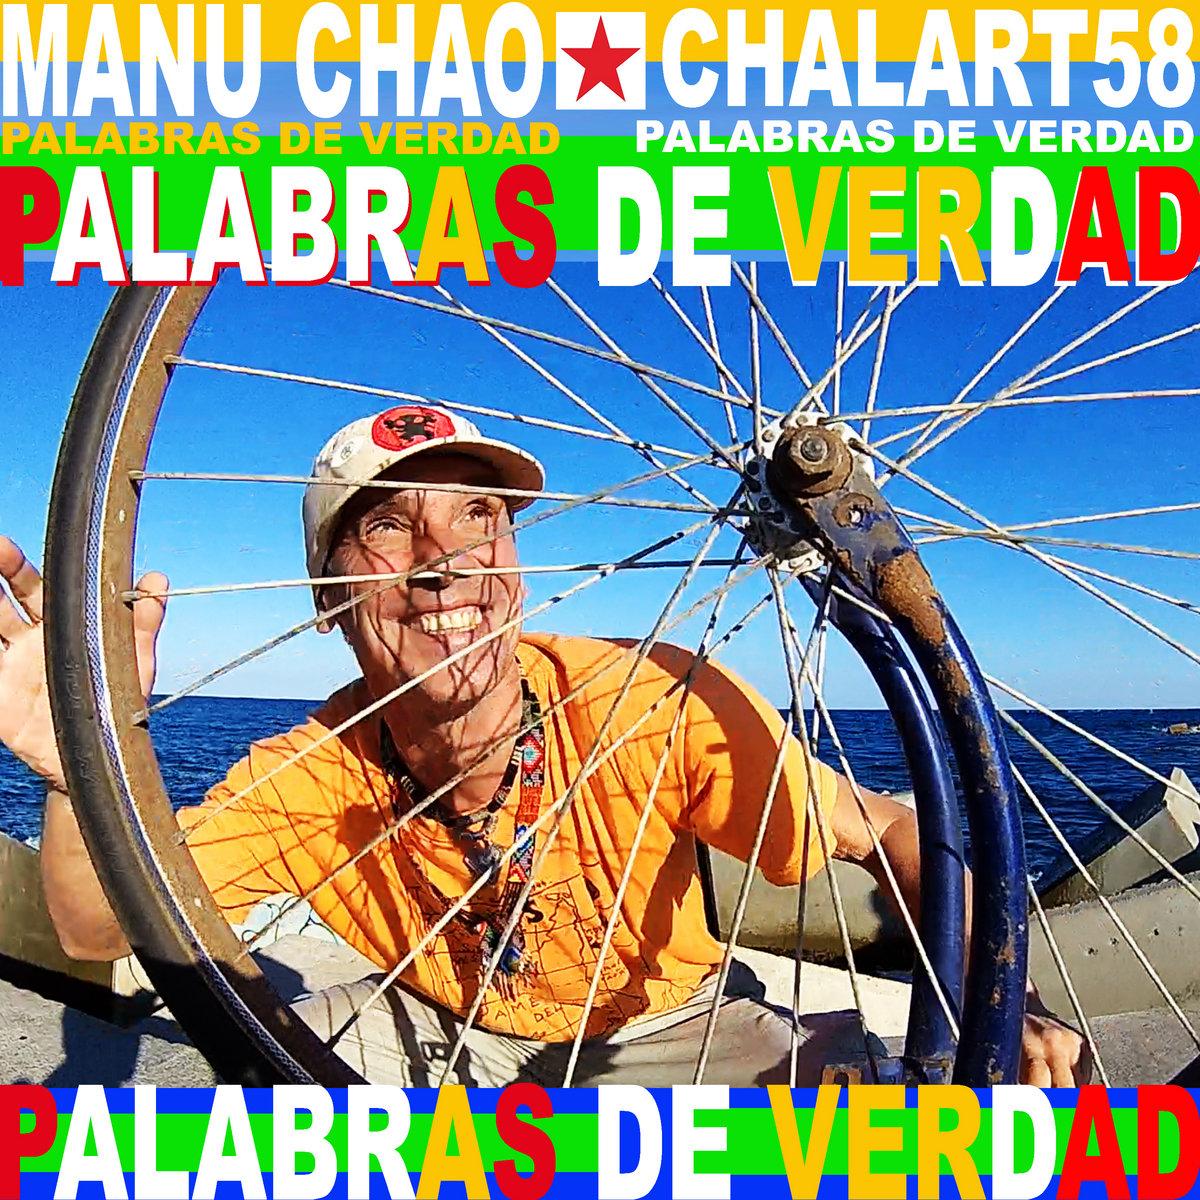 Clandestino: a la recherche de manu chao pdf download free.